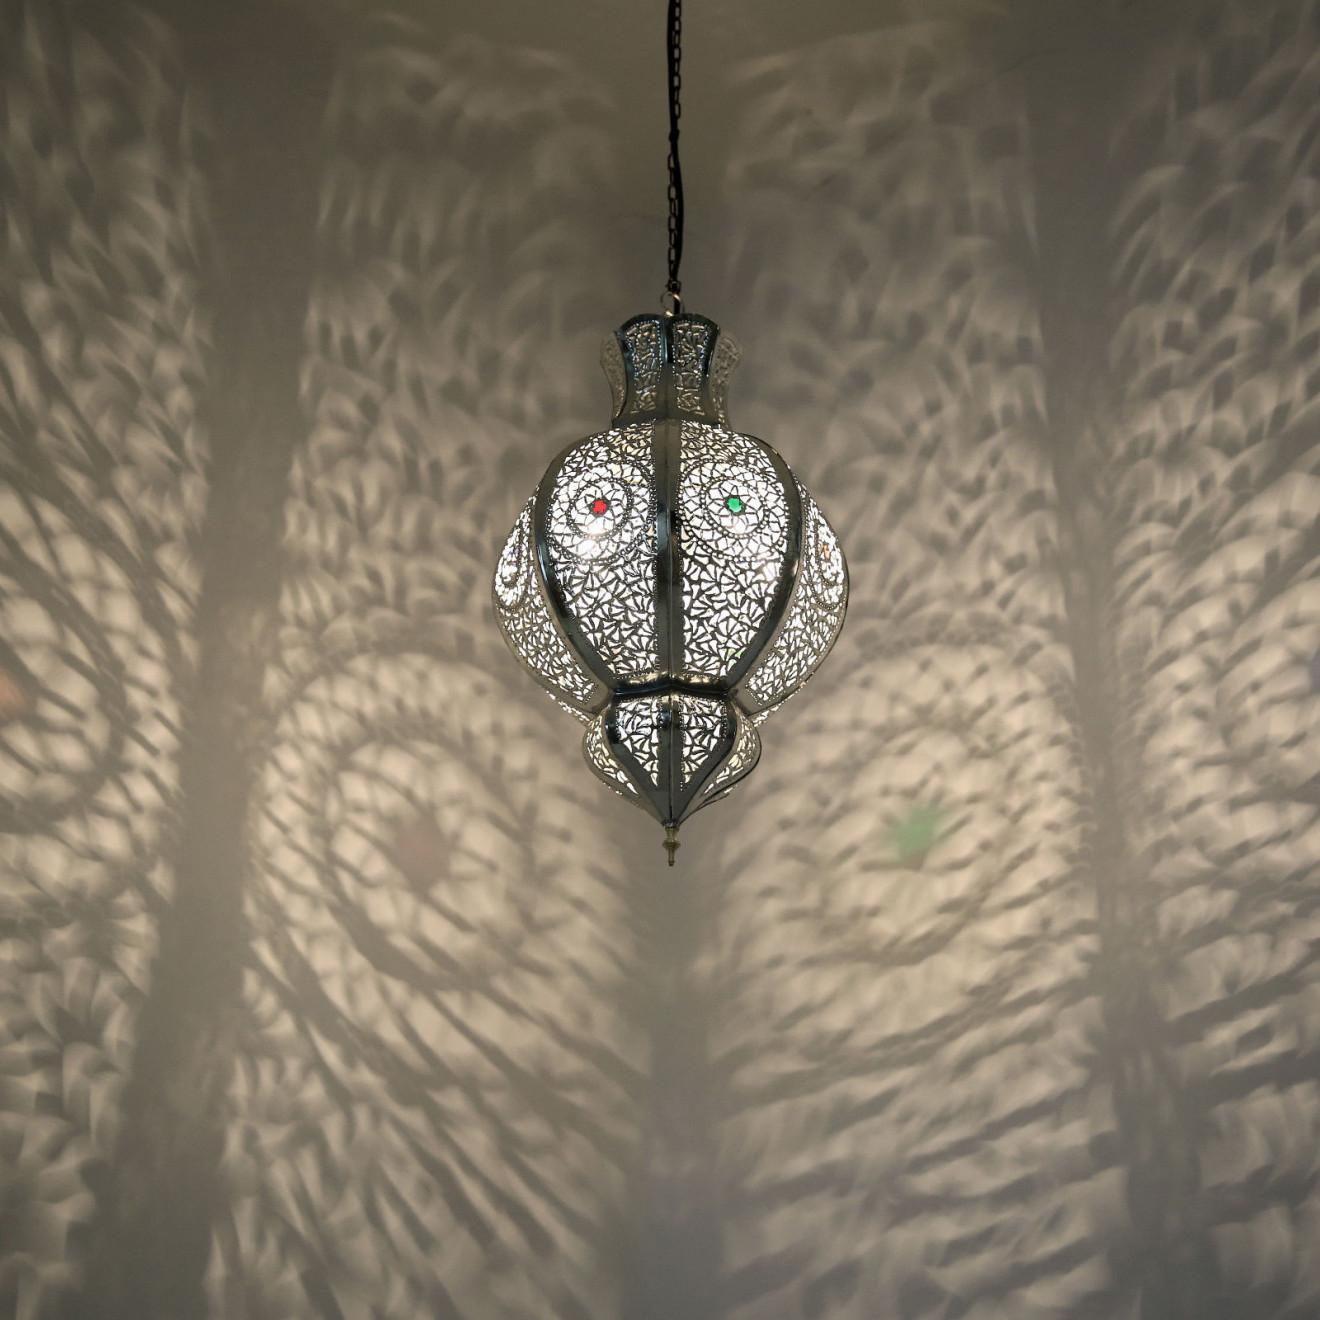 marokkanische arabische h ngelampe malika silber. Black Bedroom Furniture Sets. Home Design Ideas